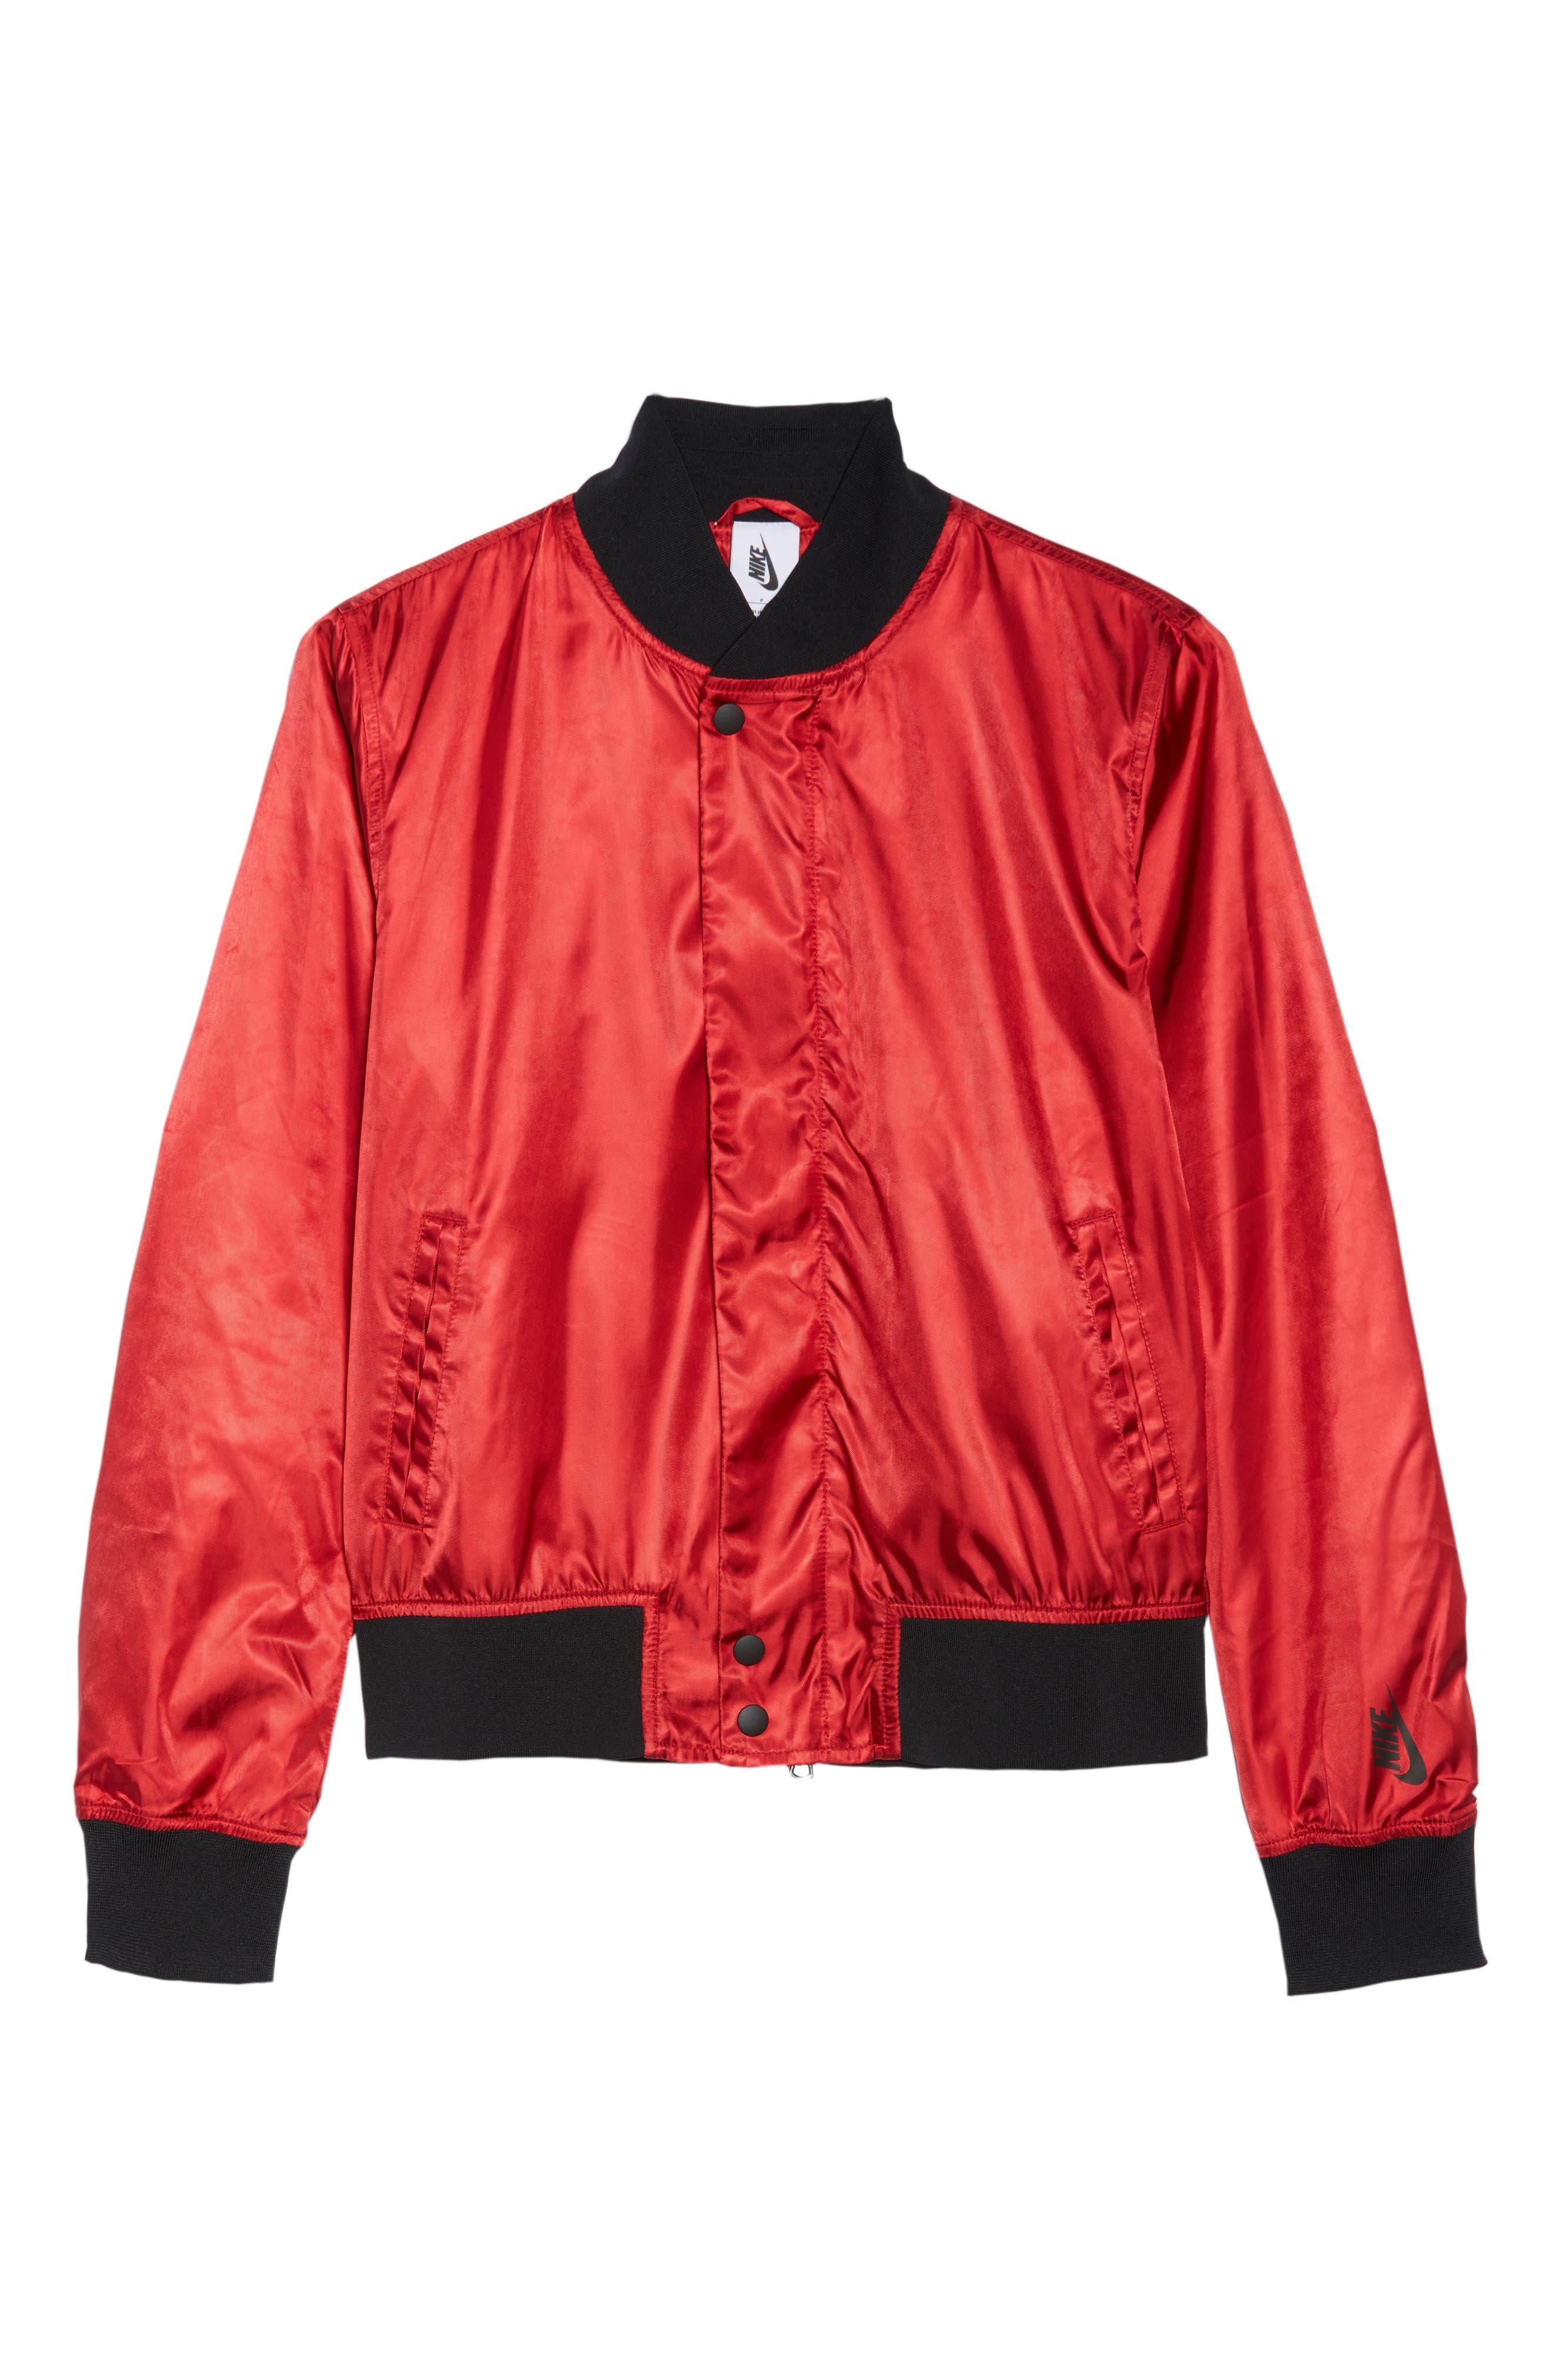 NikeLab Collection Women's Satin Bomber Jacket,                             Alternate thumbnail 6, color,                             Gym Red/ Black